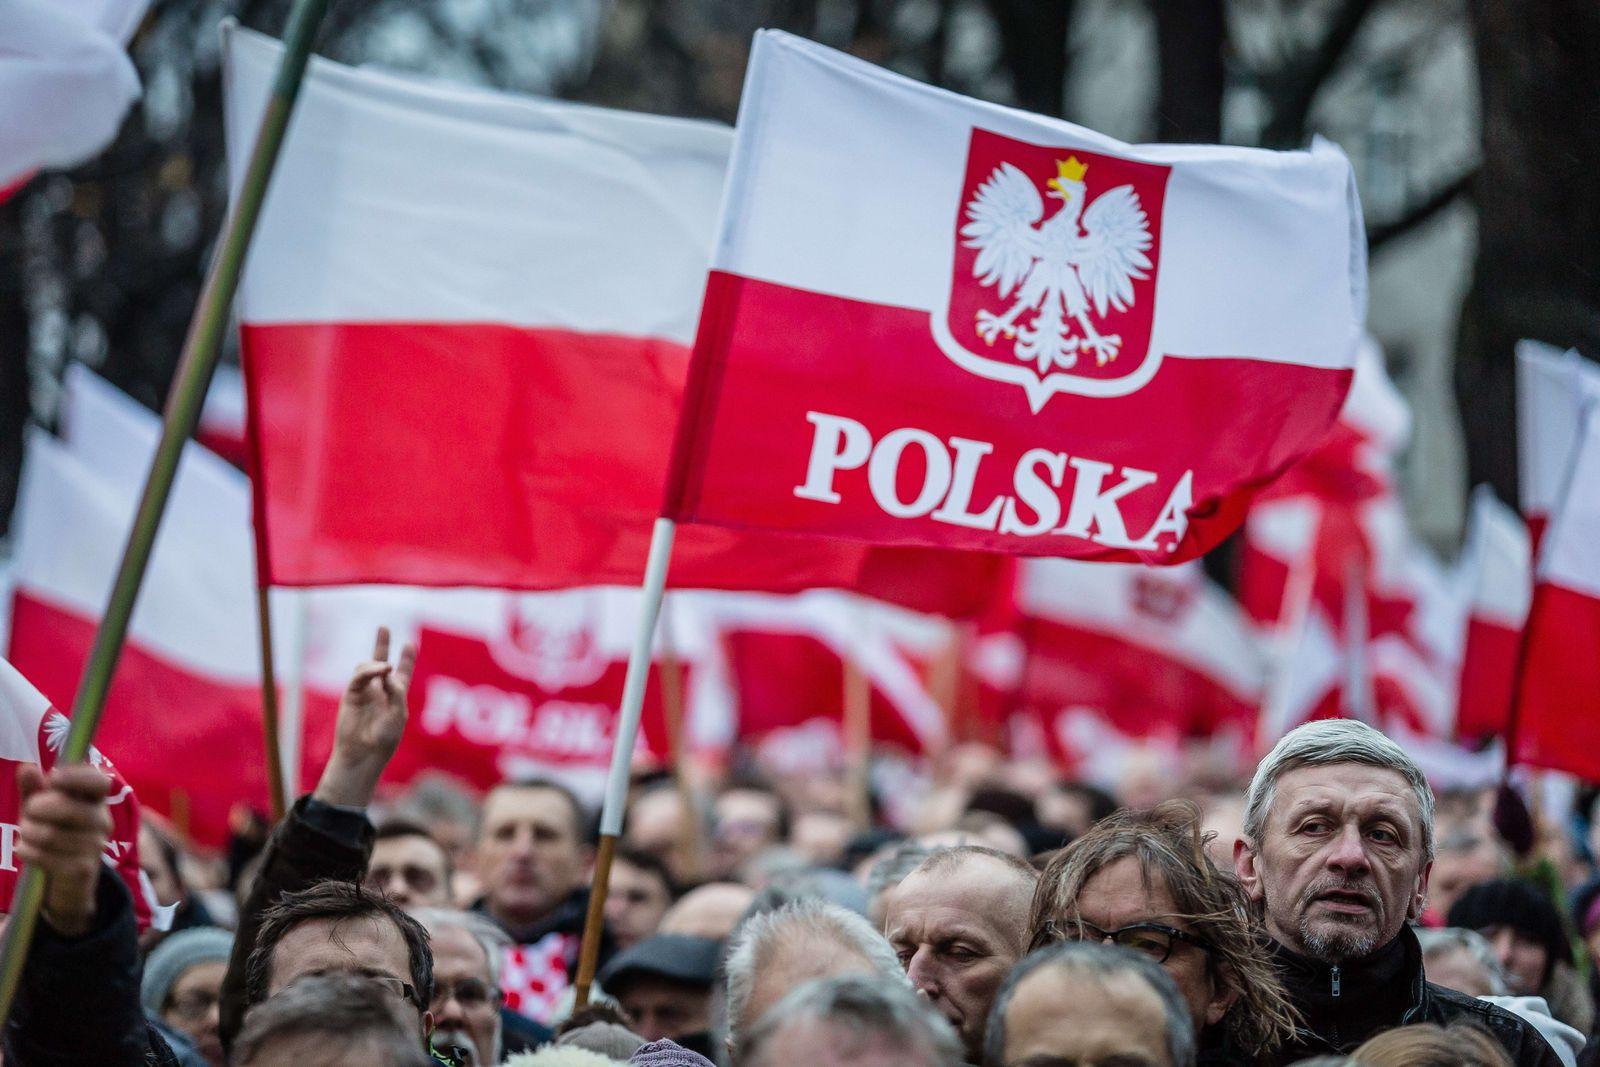 POLAND-CONSTITIUTION-DEMONSTRATION